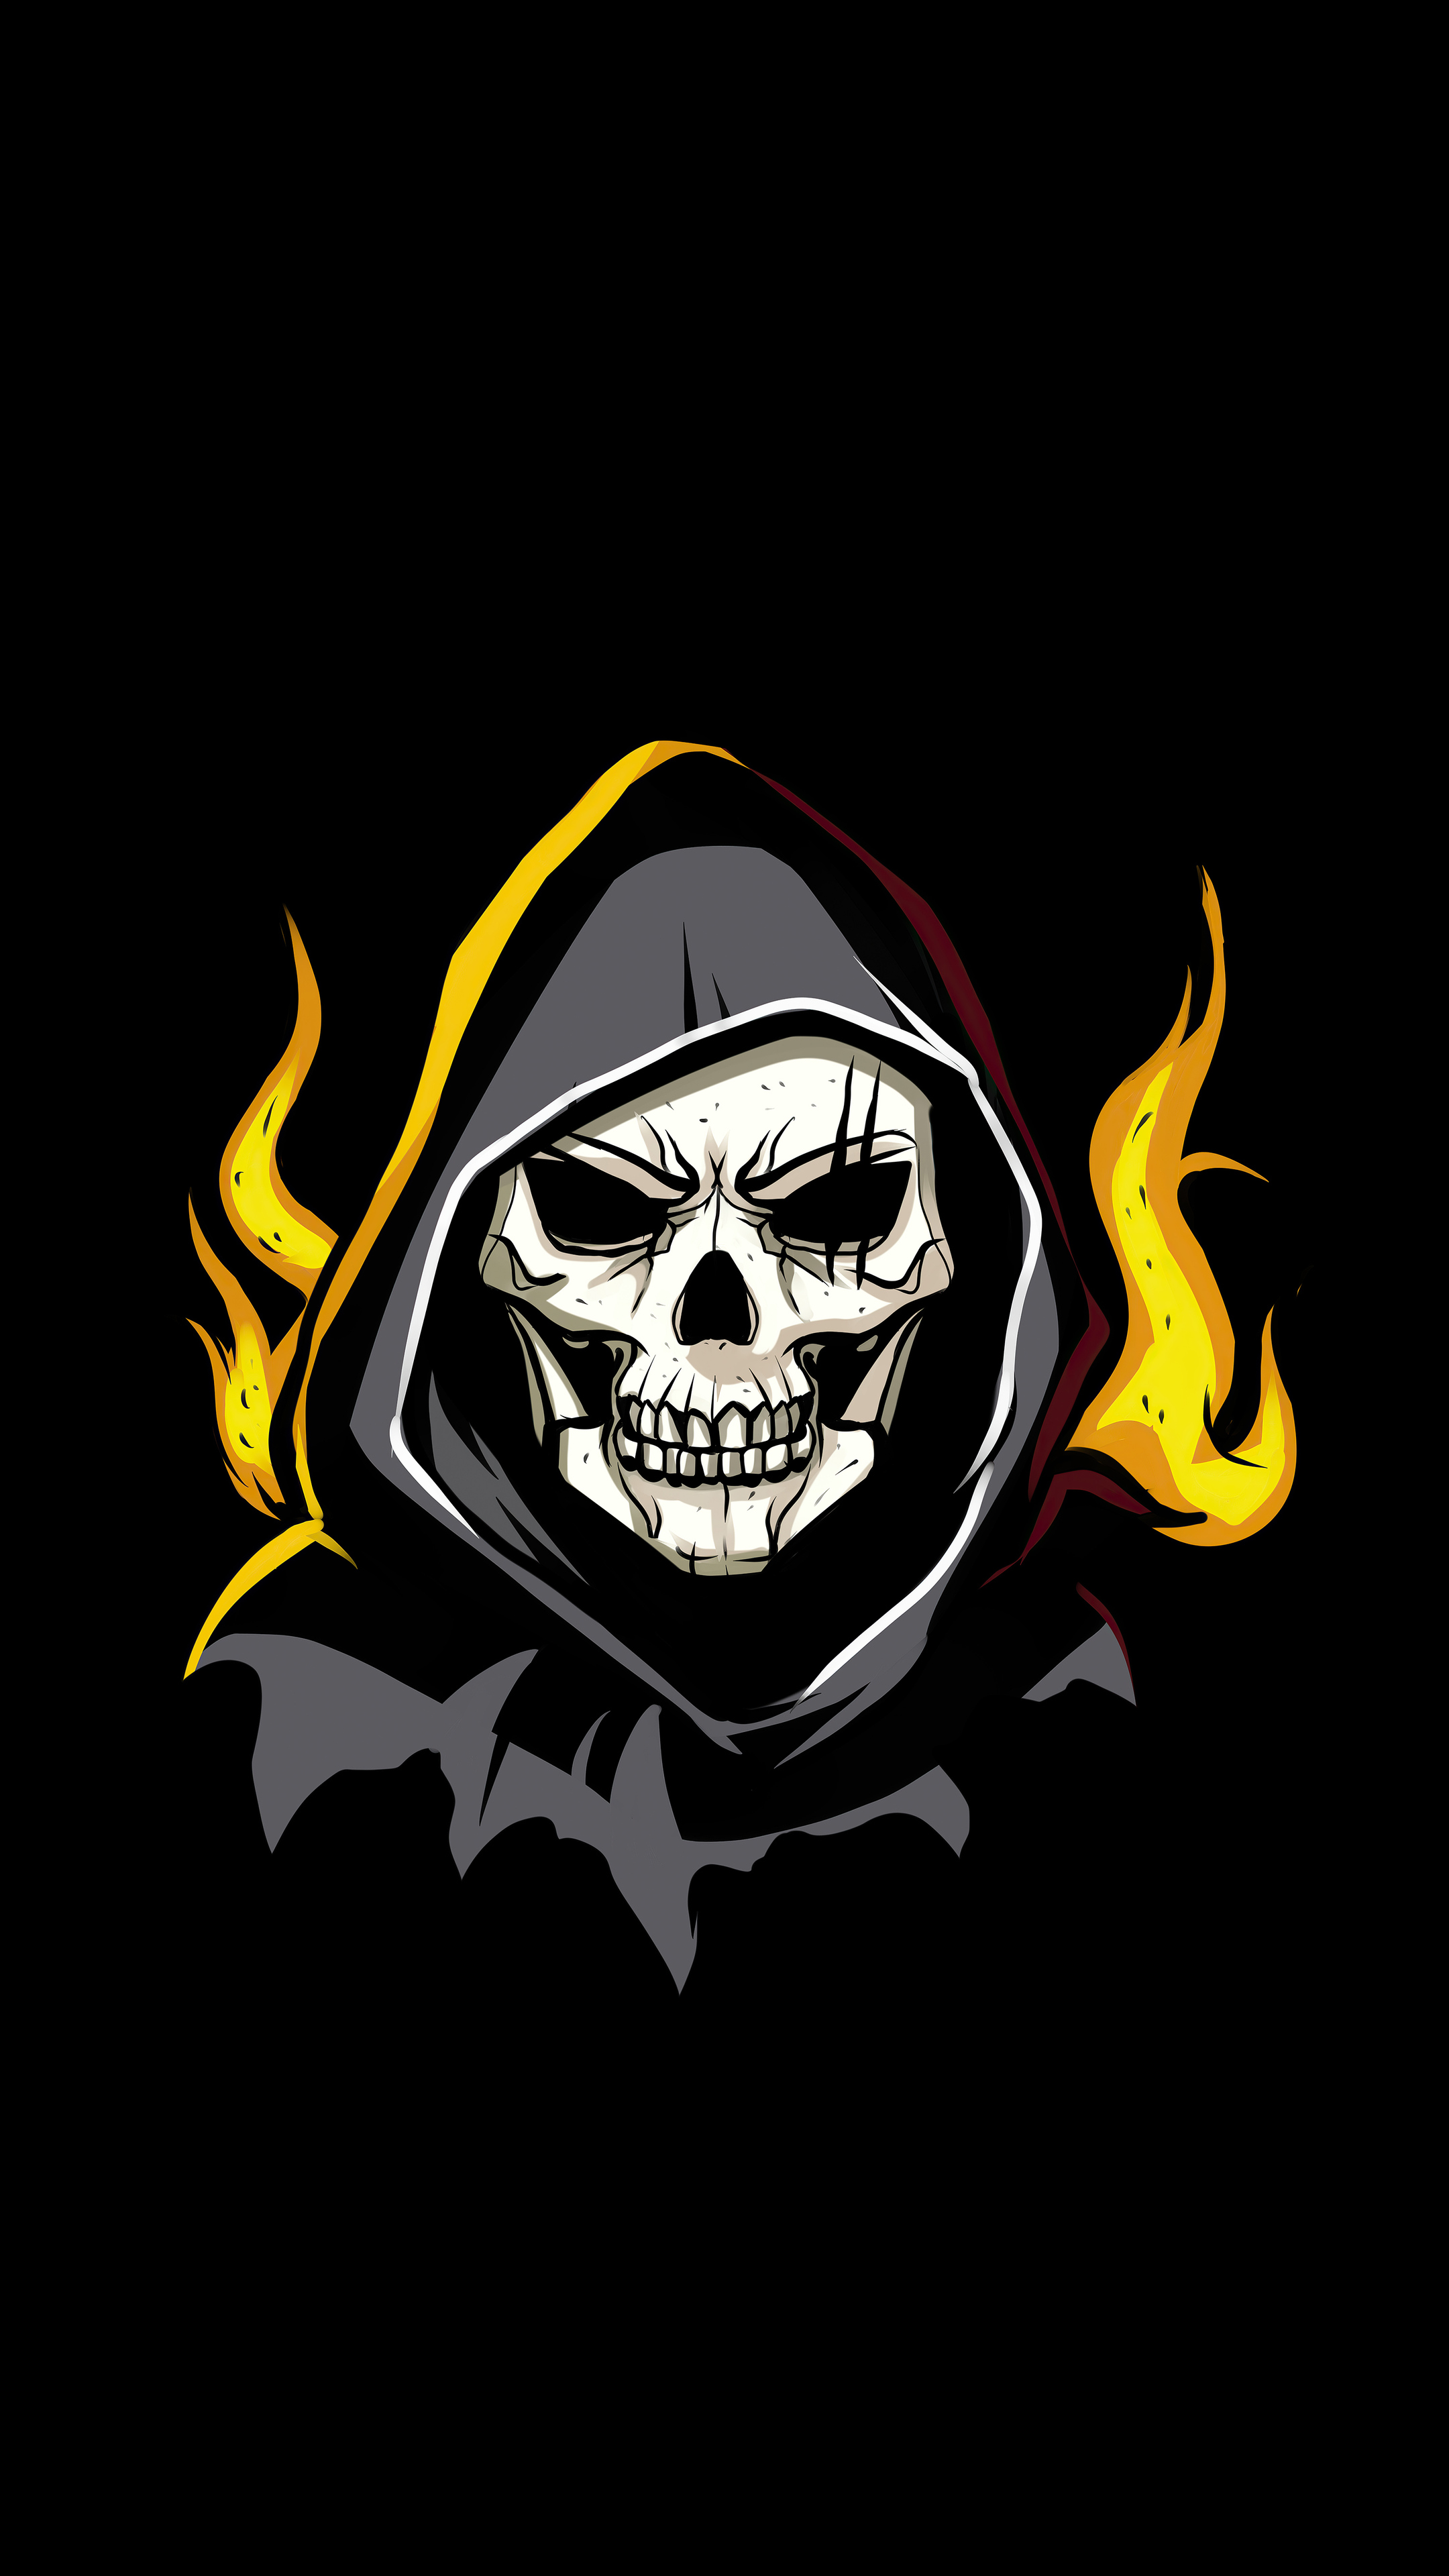 grim-reaper-minimal-art-4k-xz.jpg